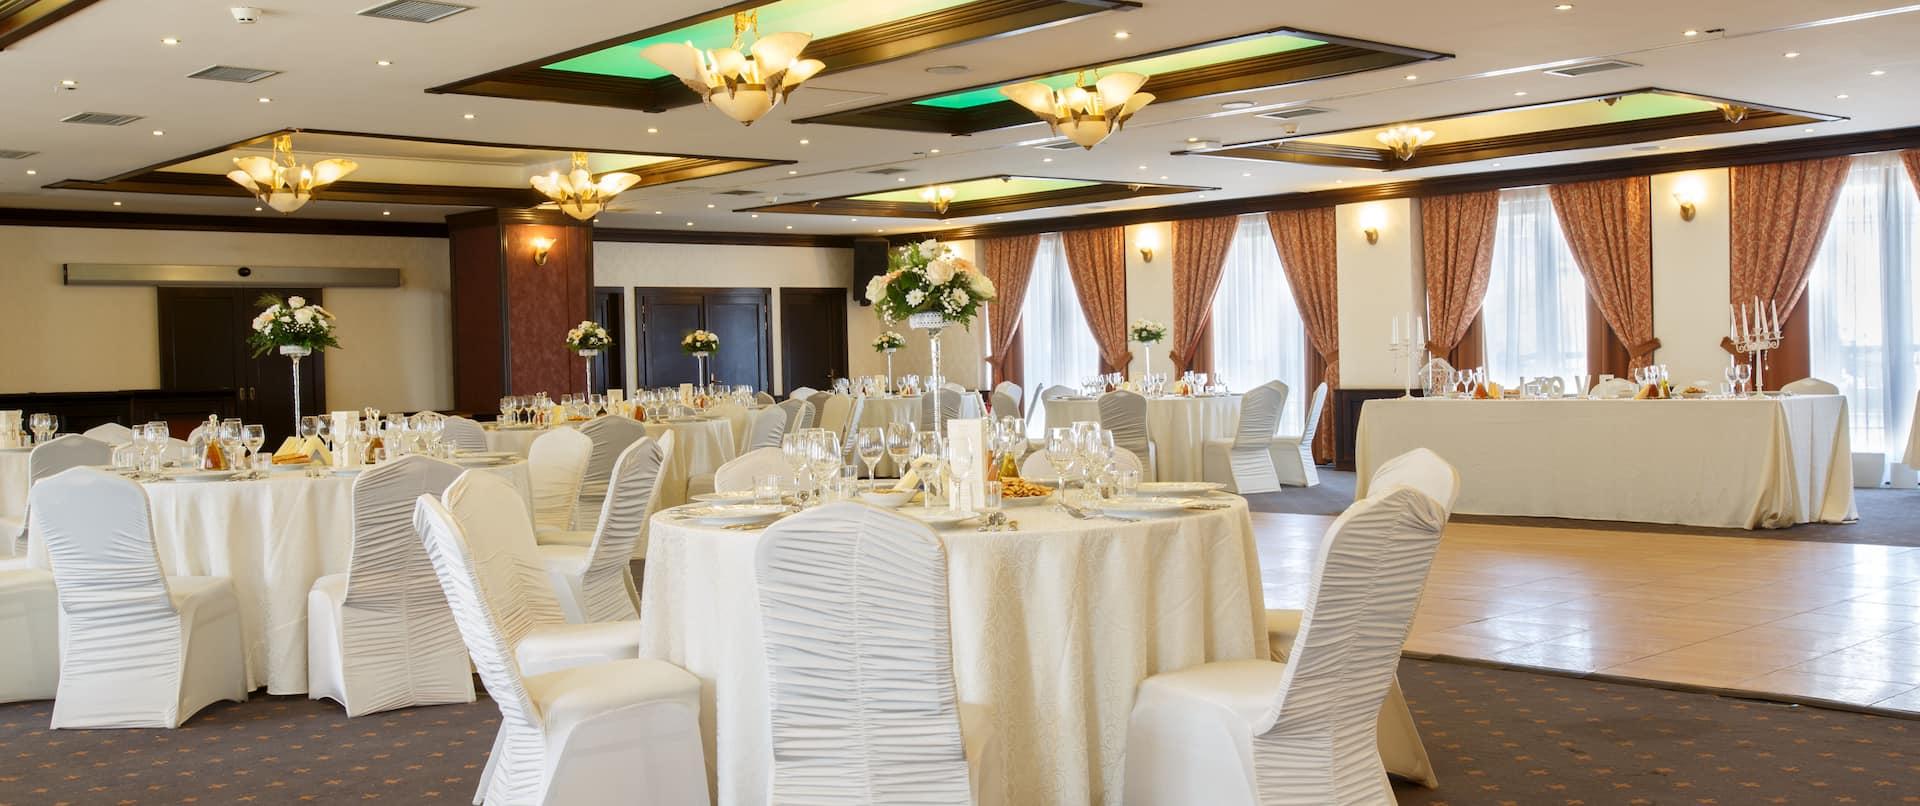 Arthur Ballroom Wedding Setup